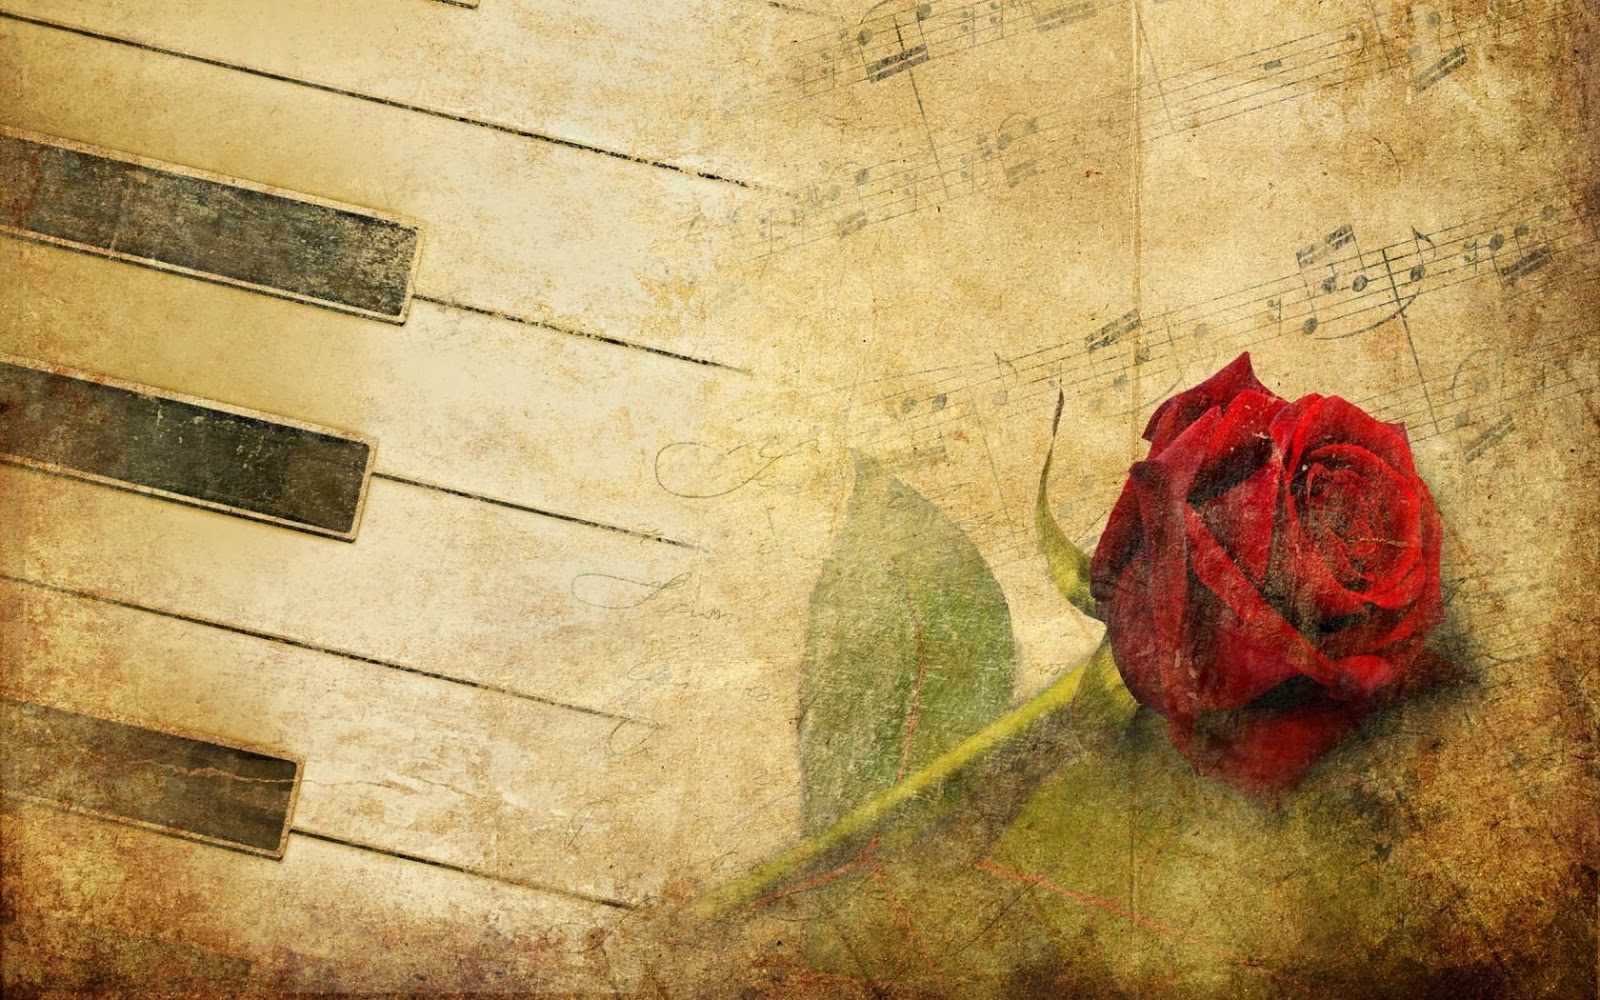 Maroon-Rose-with-piano-keyboard-keys-art-Template-image-HD-download.jpg